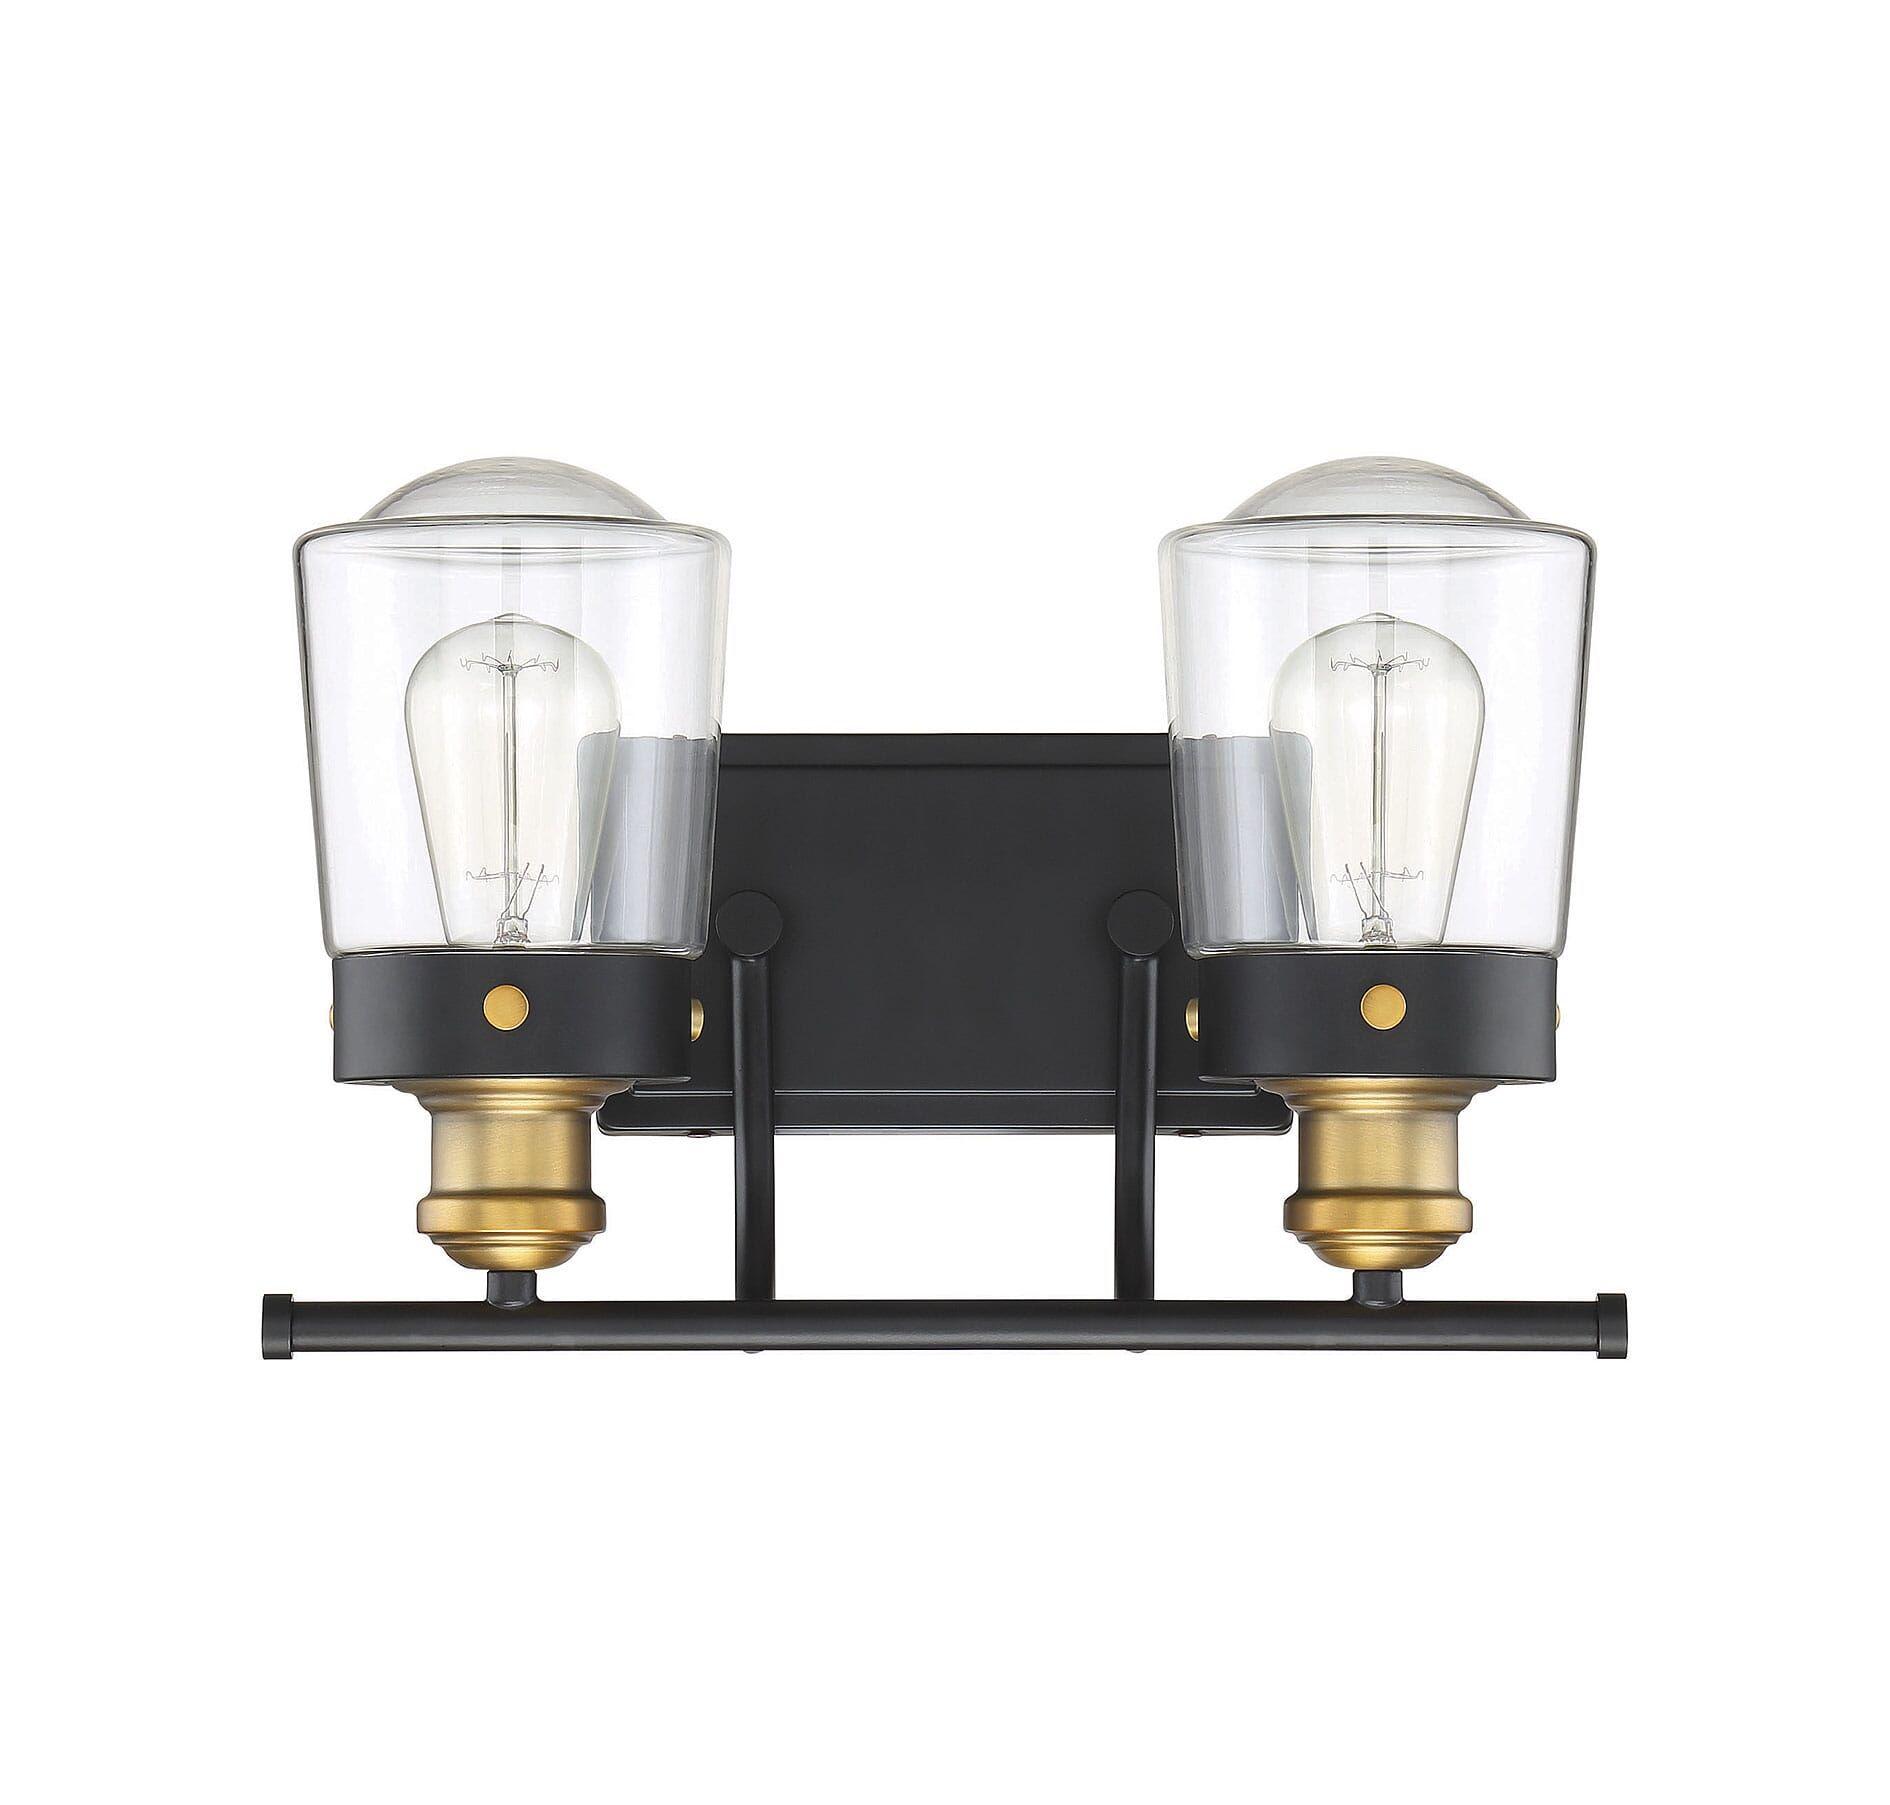 Photo of Savoy House Macauley 2-light bathroom vanity light in vintage black with warm brass